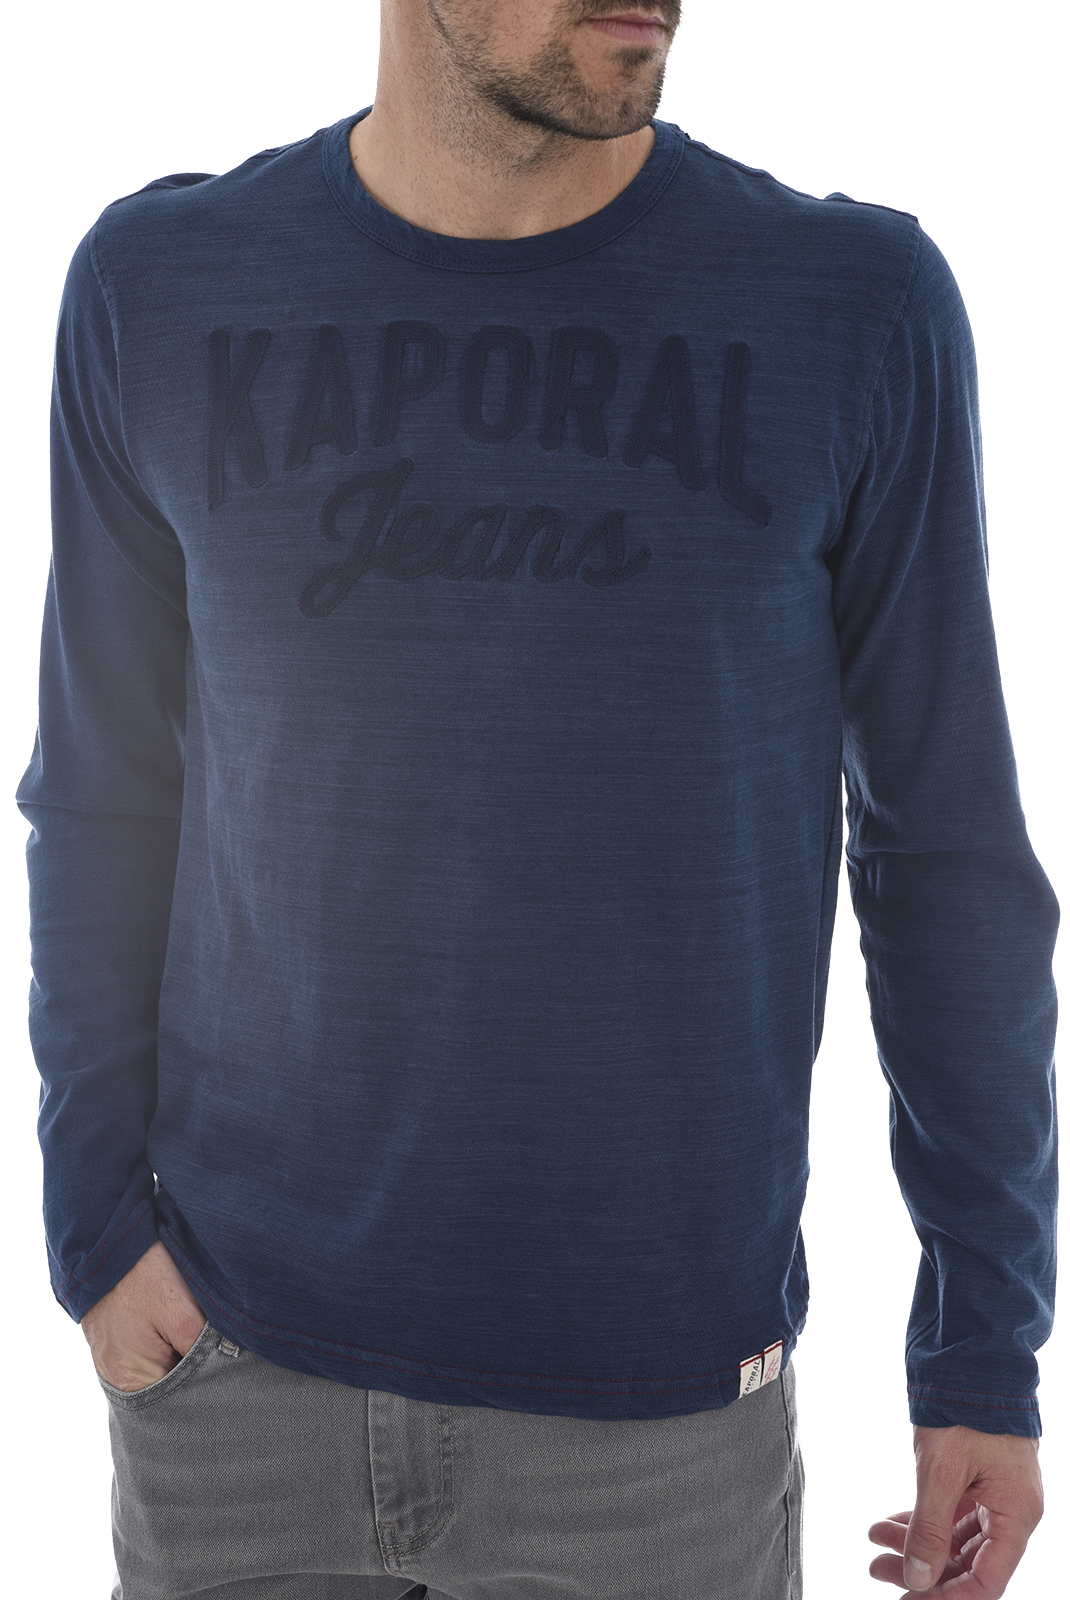 Kaporal Bora / Tee-Shirt \u0026 Vêtements